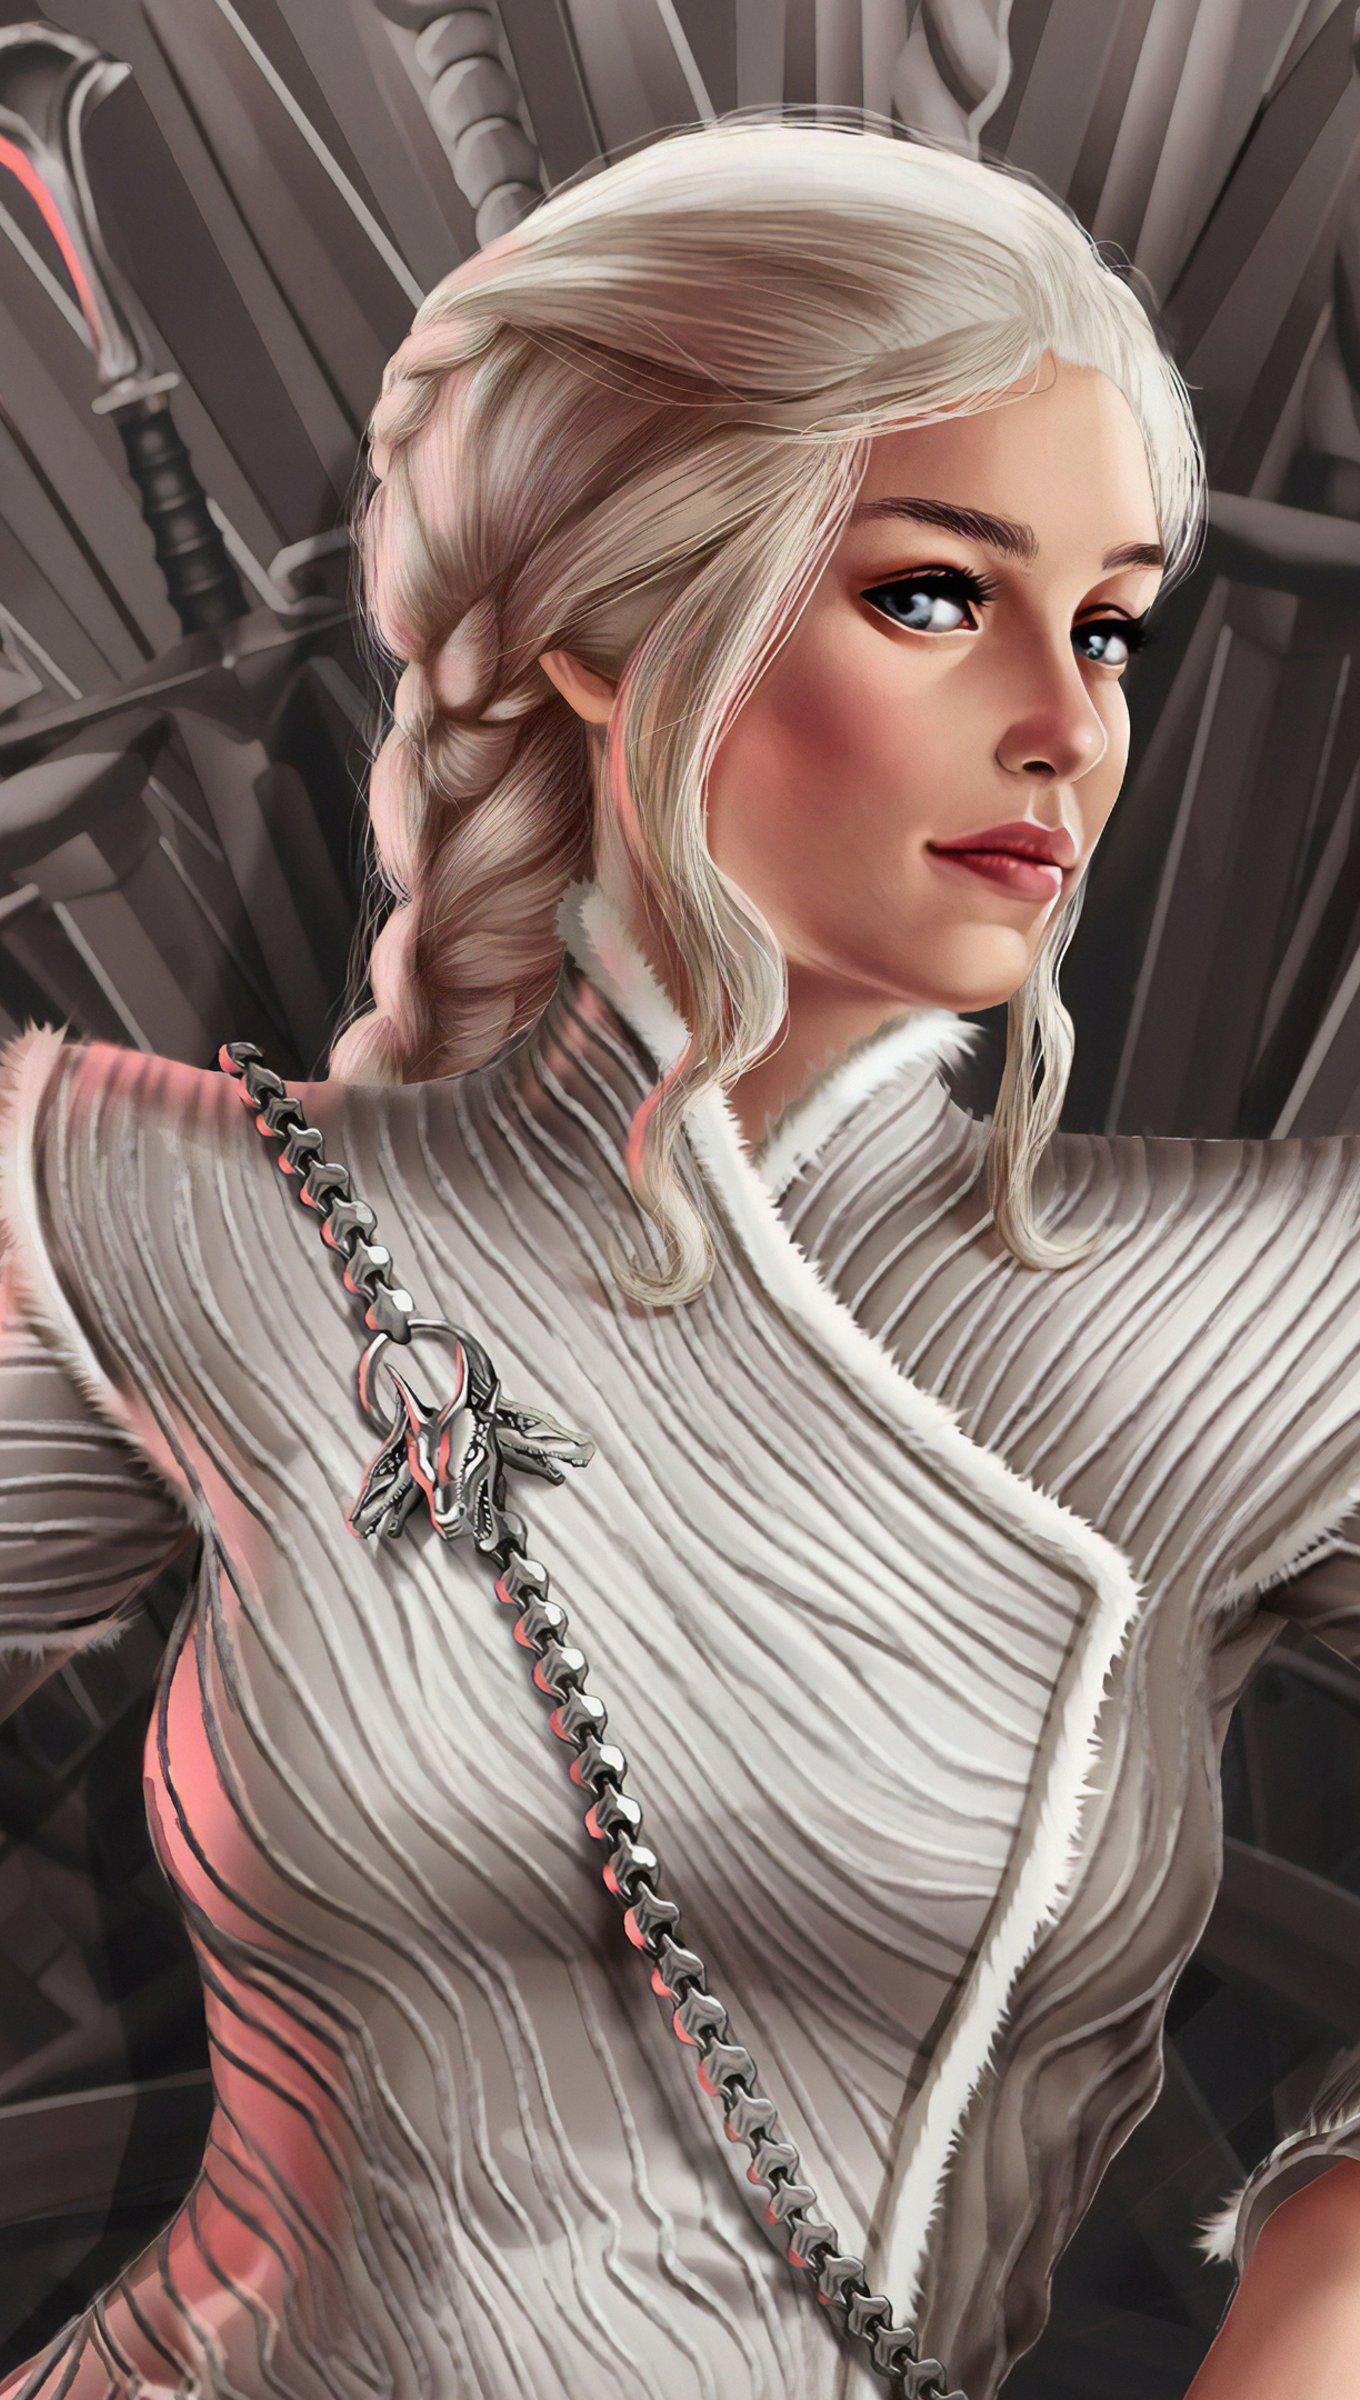 Fondos de pantalla Deanerys Targaryen Fanart Vertical